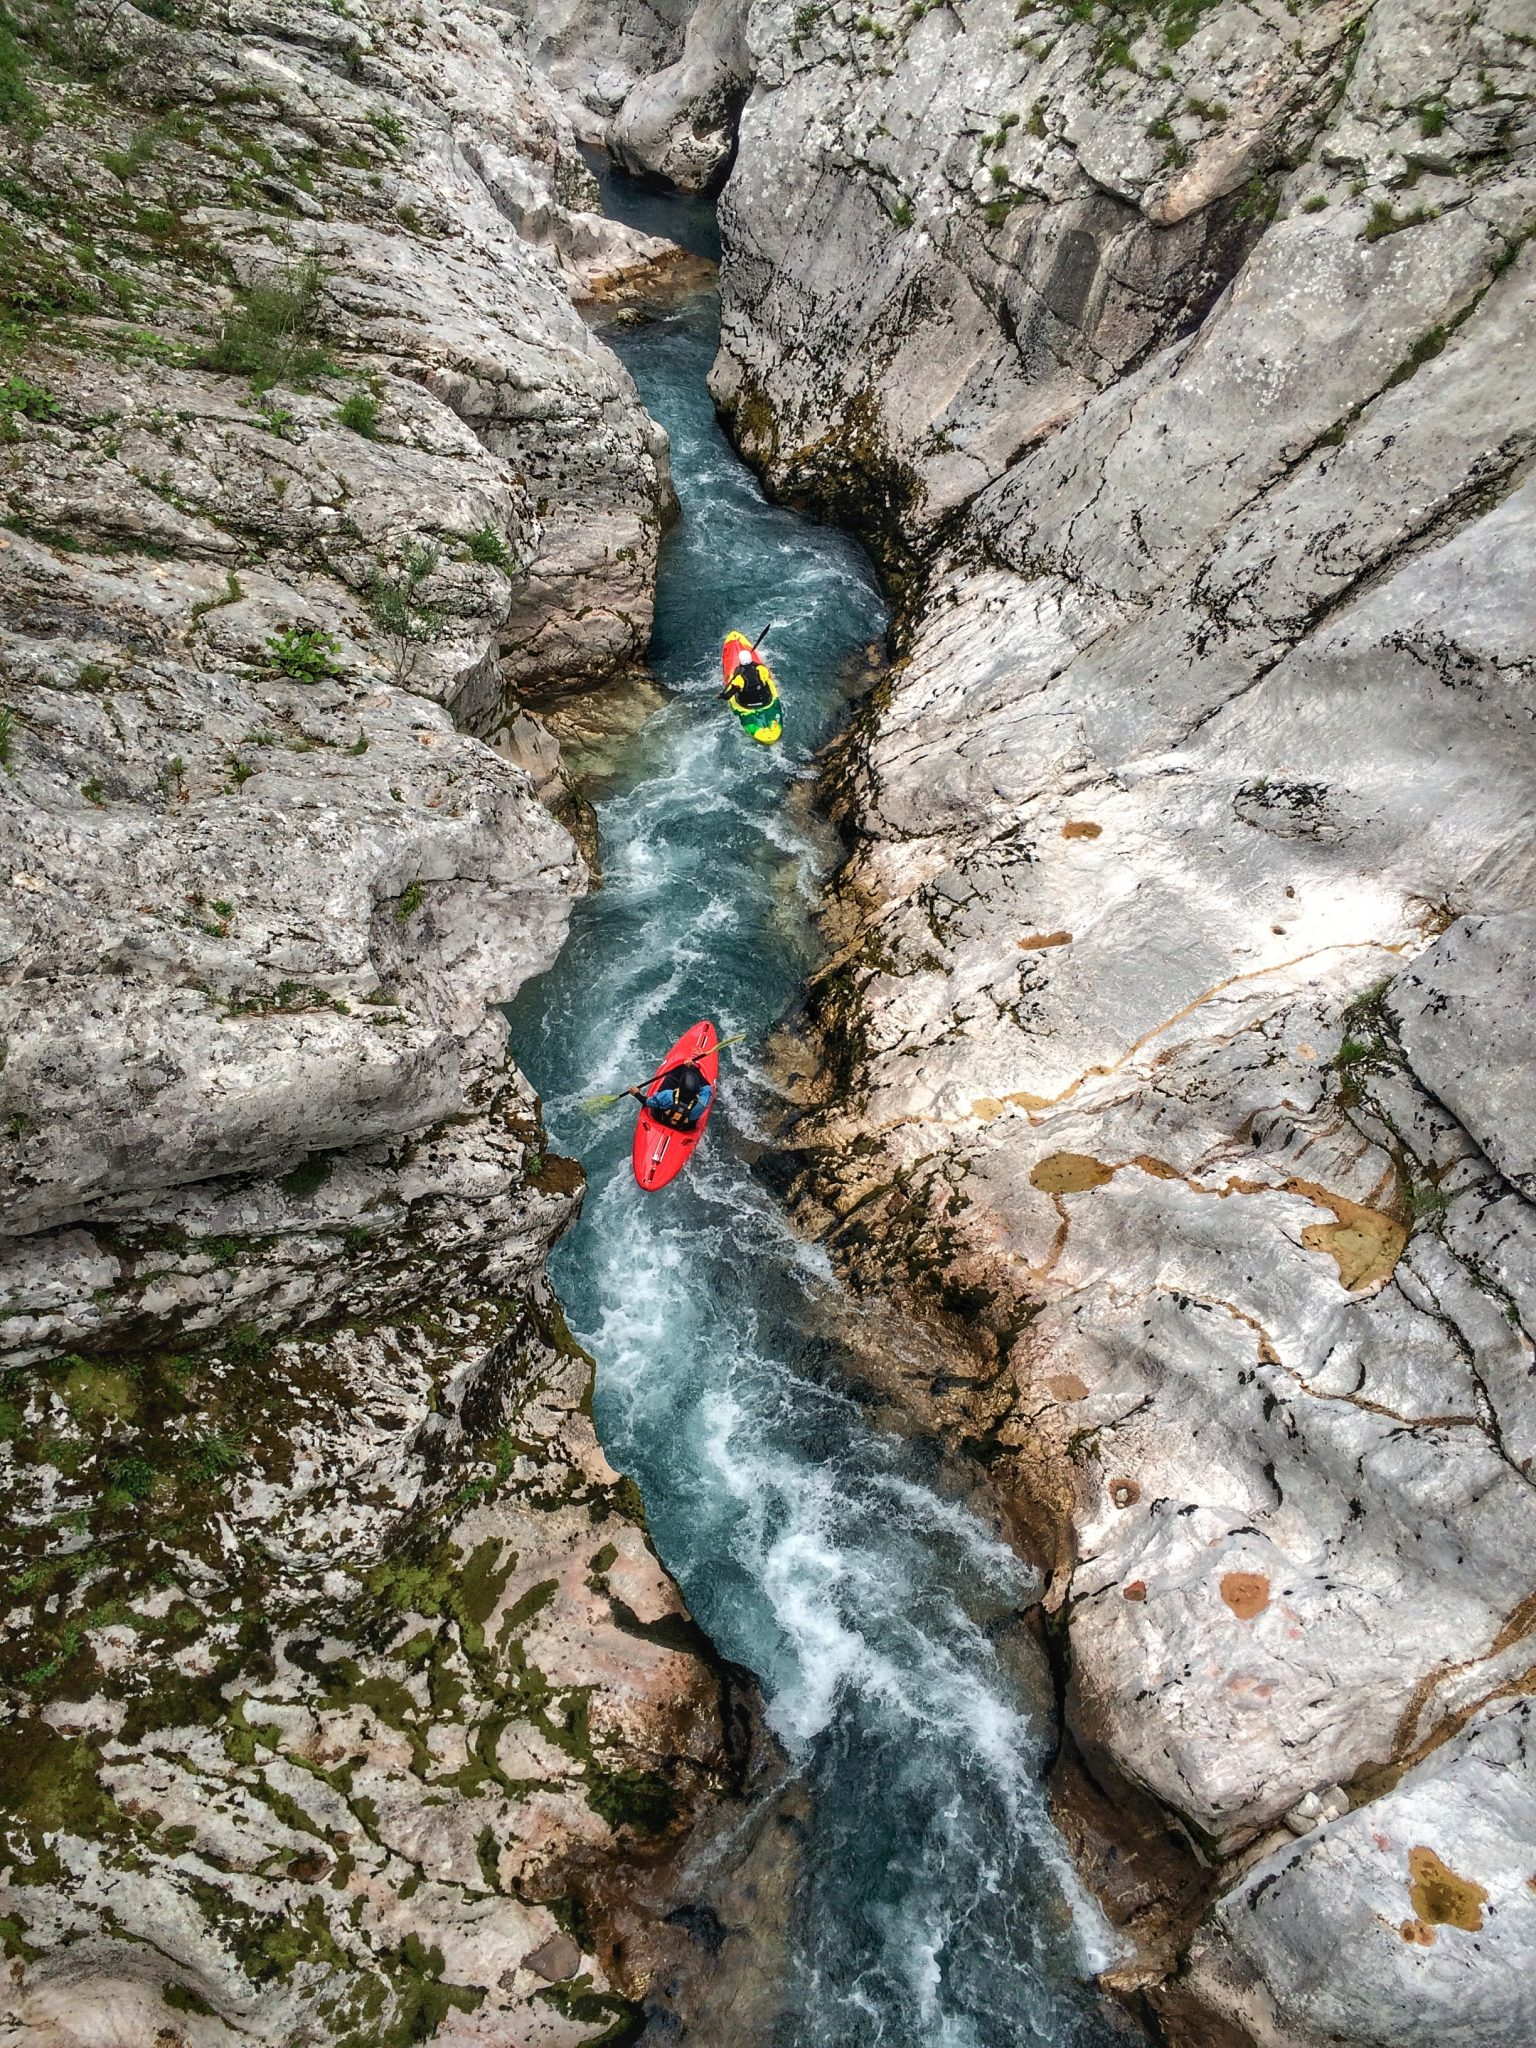 kayaking soca gorge canyon for advanced paddler in slovenia